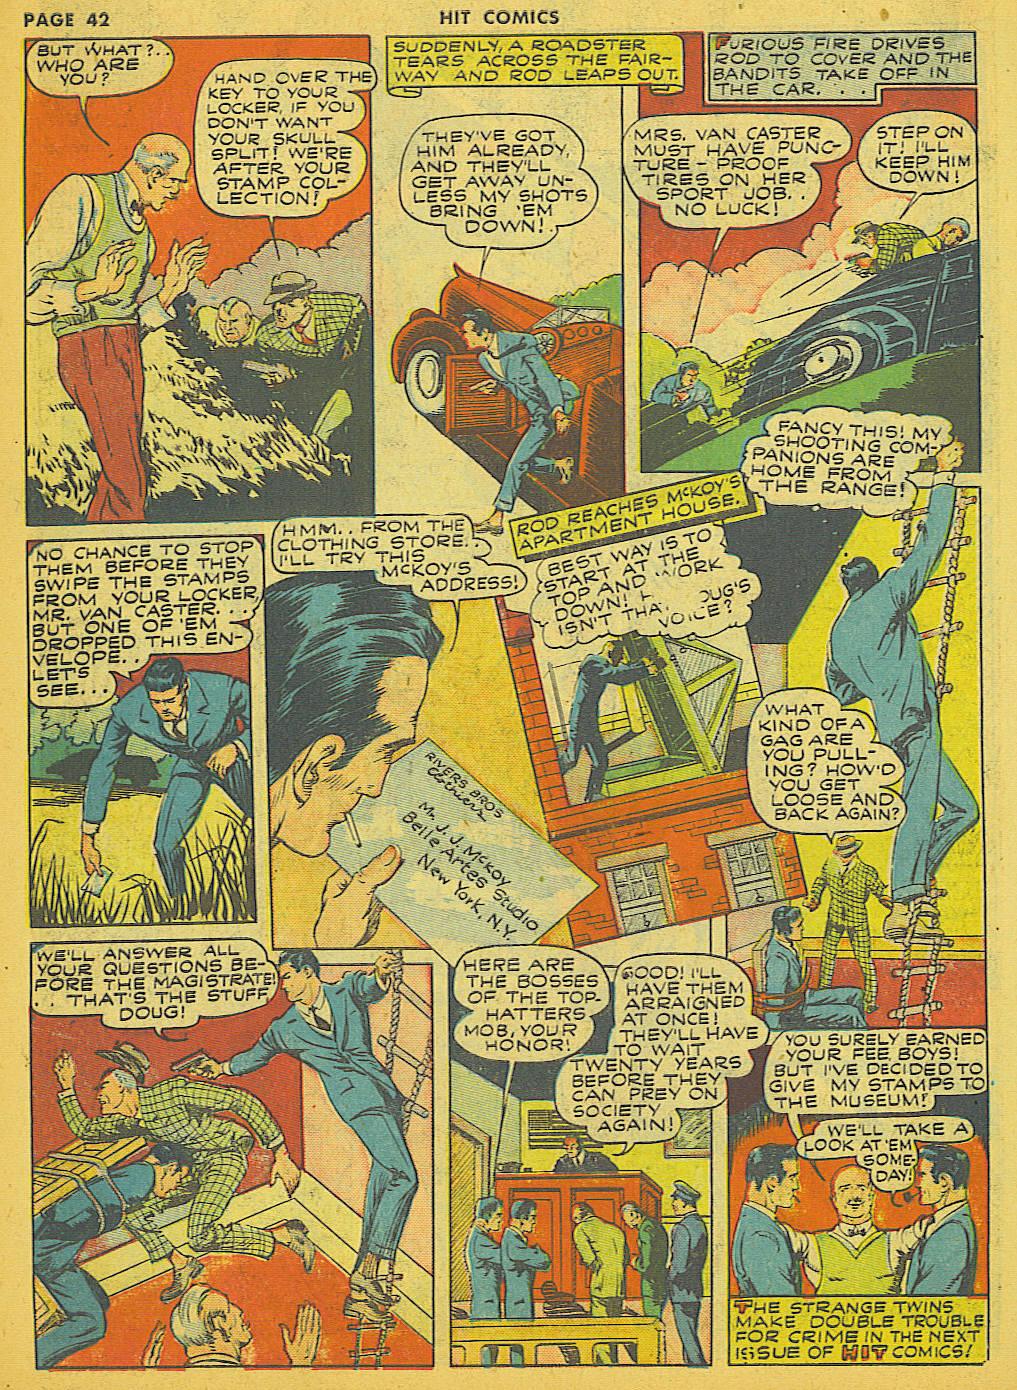 Read online Hit Comics comic -  Issue #21 - 44